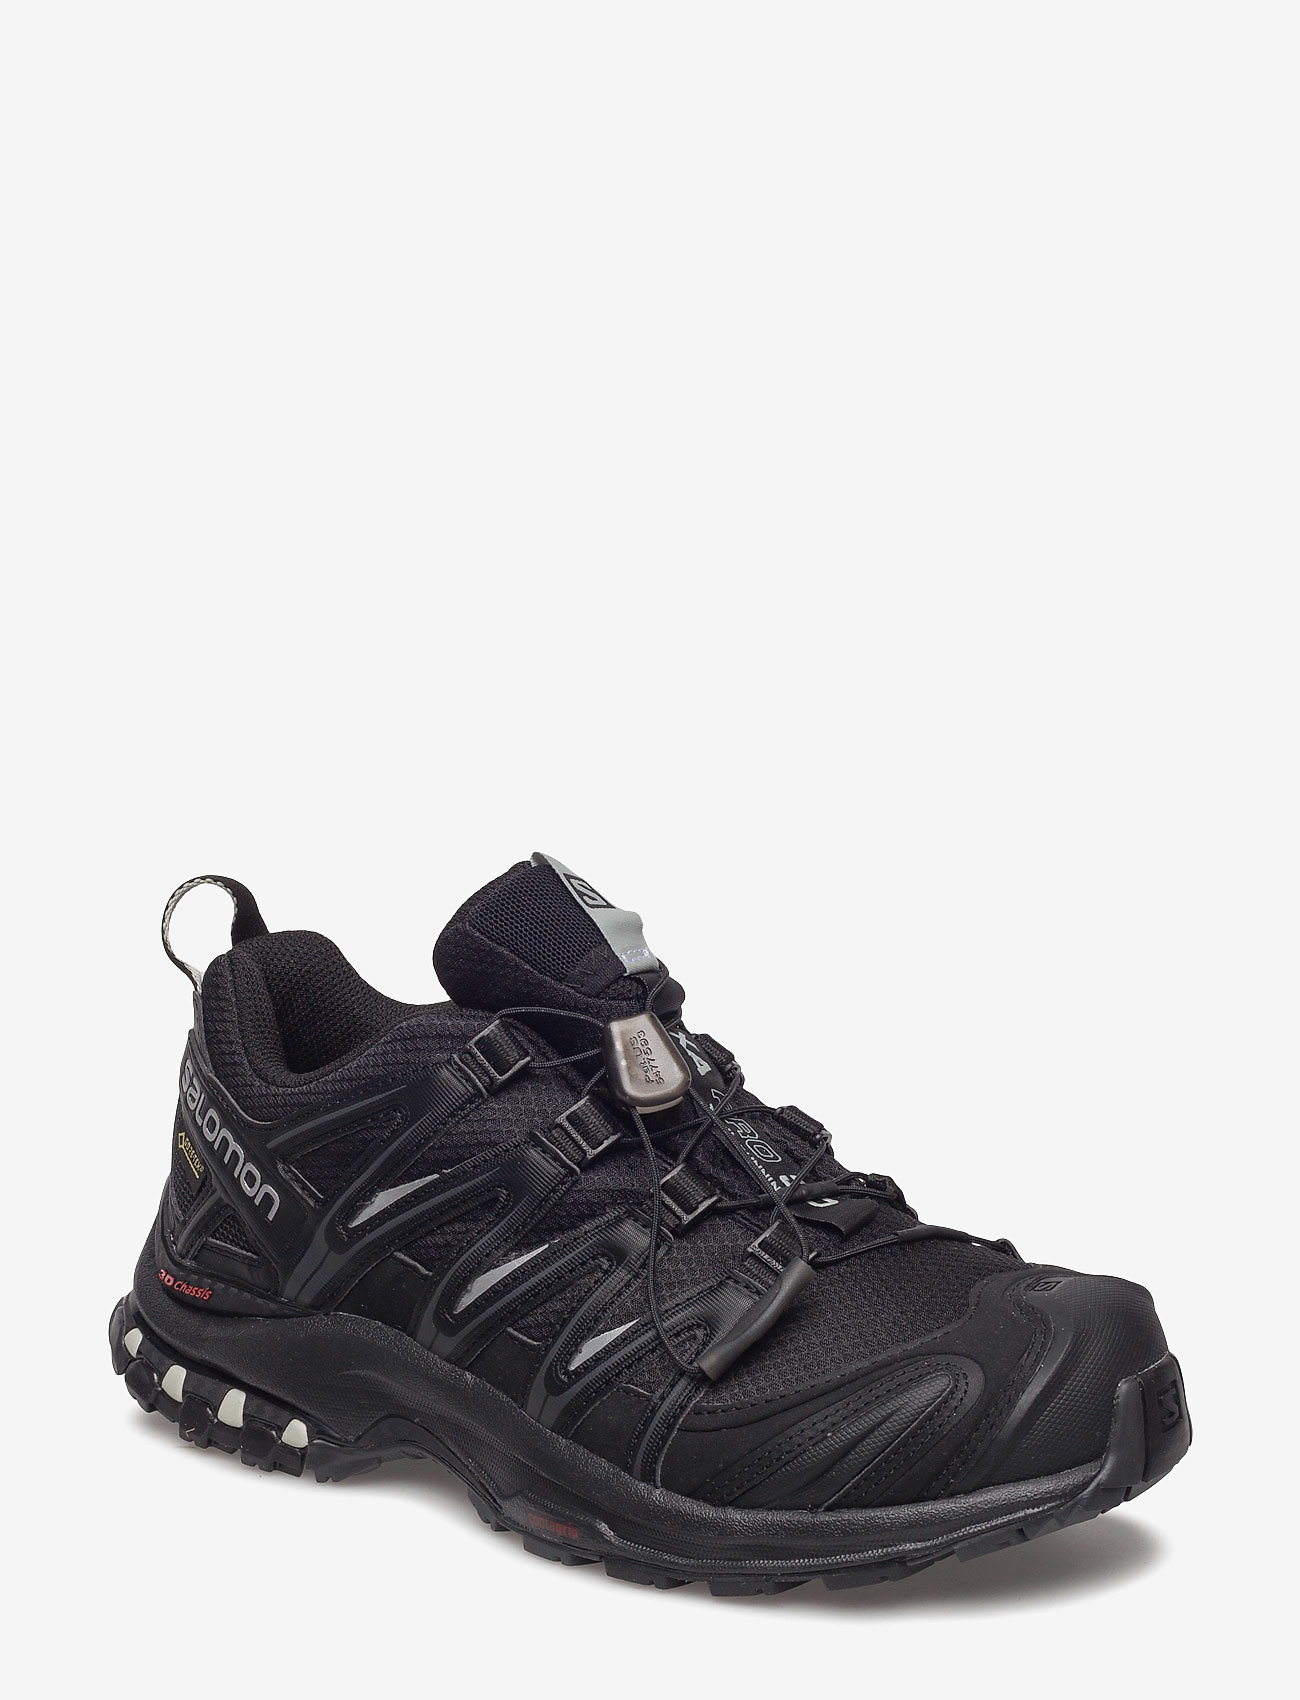 Shoes Xa Pro 3d Gtx W (Black/black